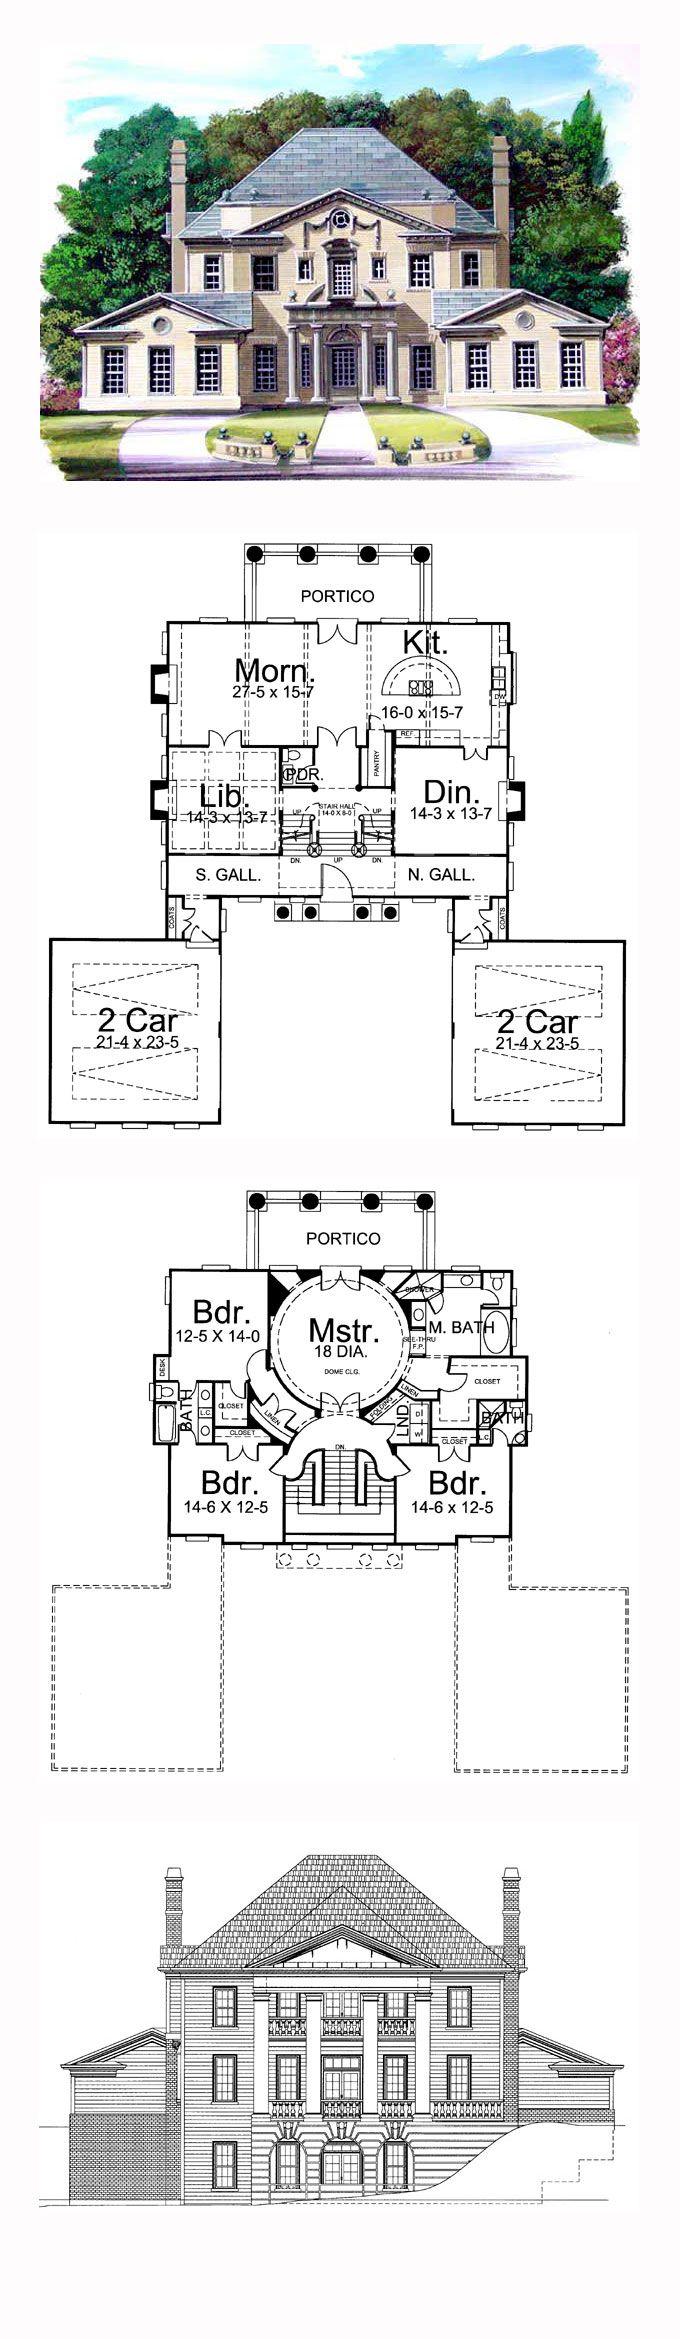 Greek Revival House Plan 72049 | Total Living Area: 3270 sq. ft., 4 bedrooms and 3 bathrooms. #greekrevivalhome